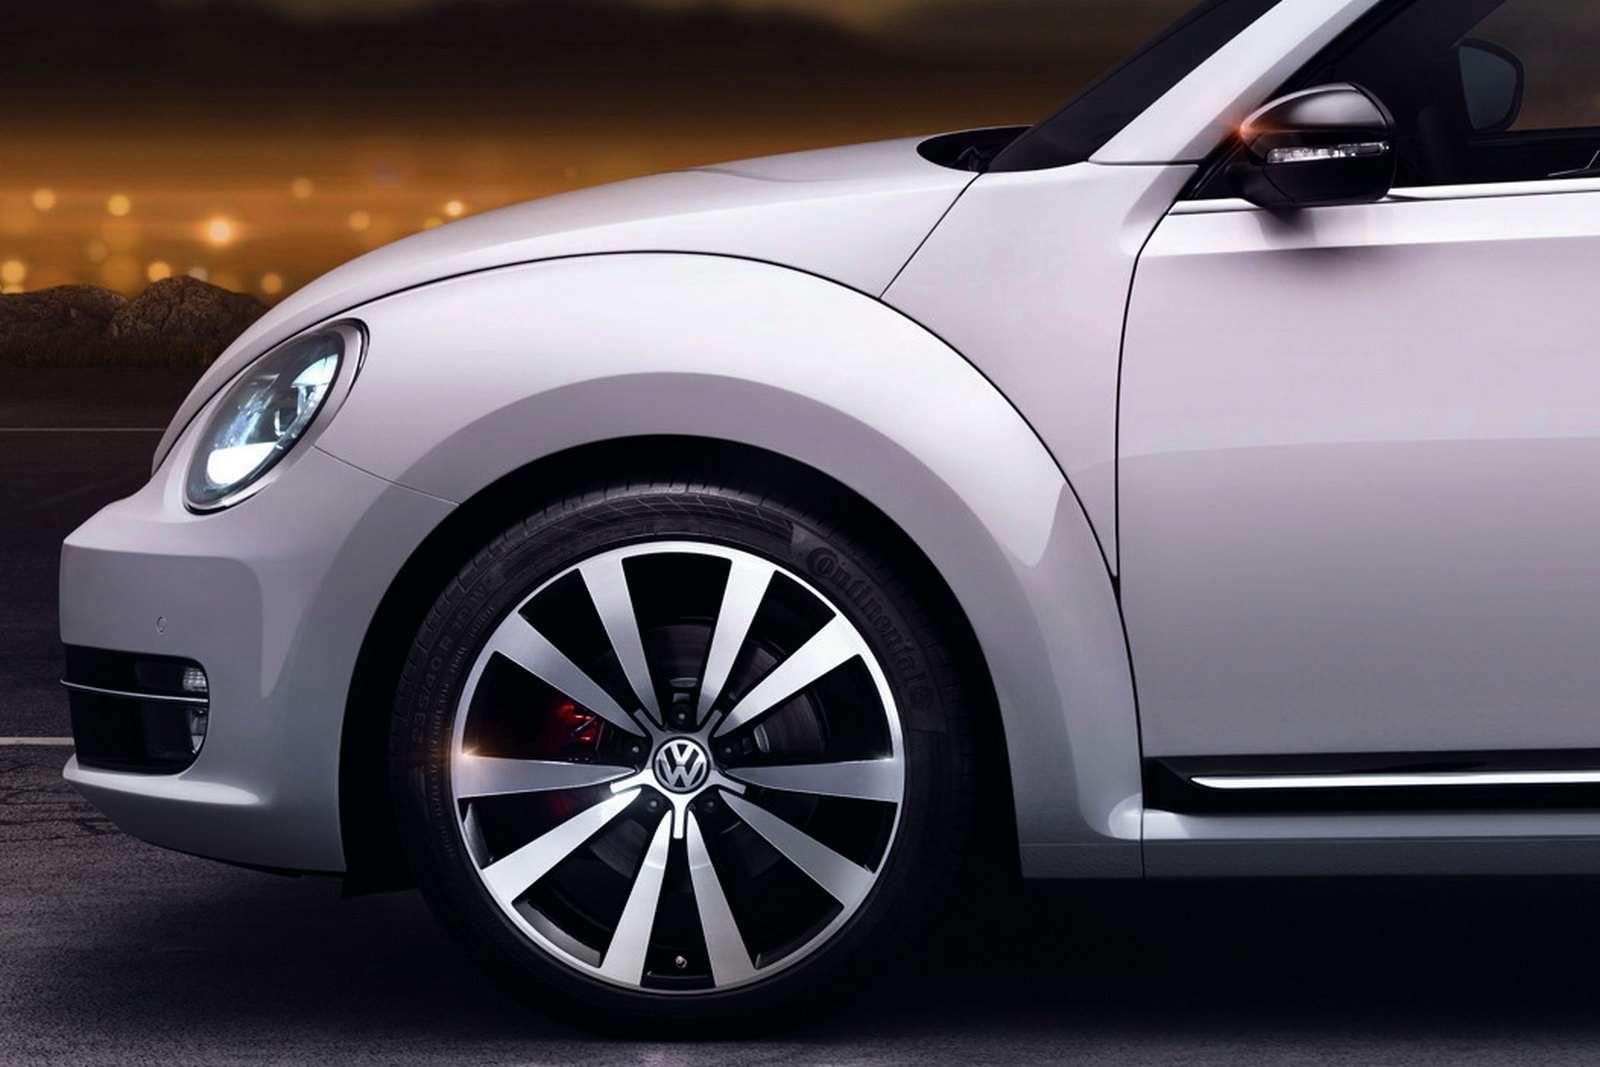 VW Nev Beetle oficjalnie kwiecien 2011